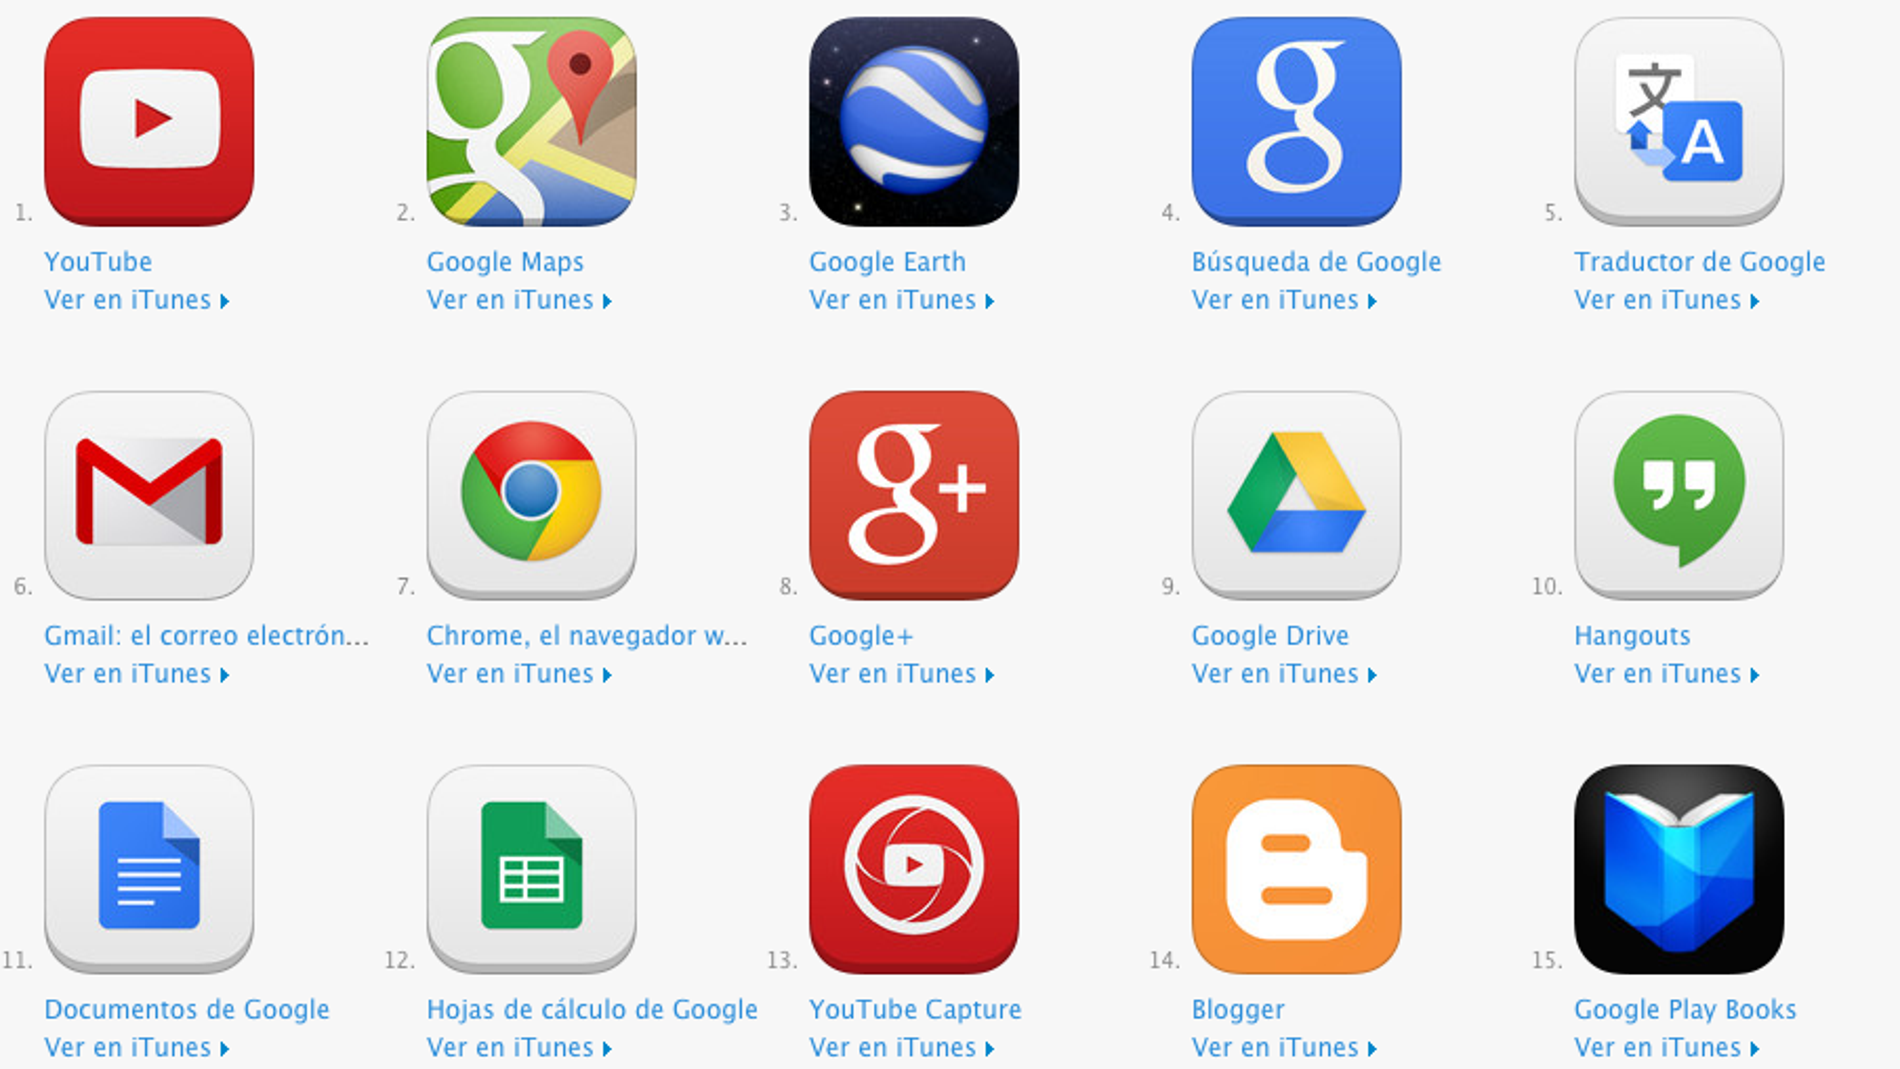 Apps de Google en iOS